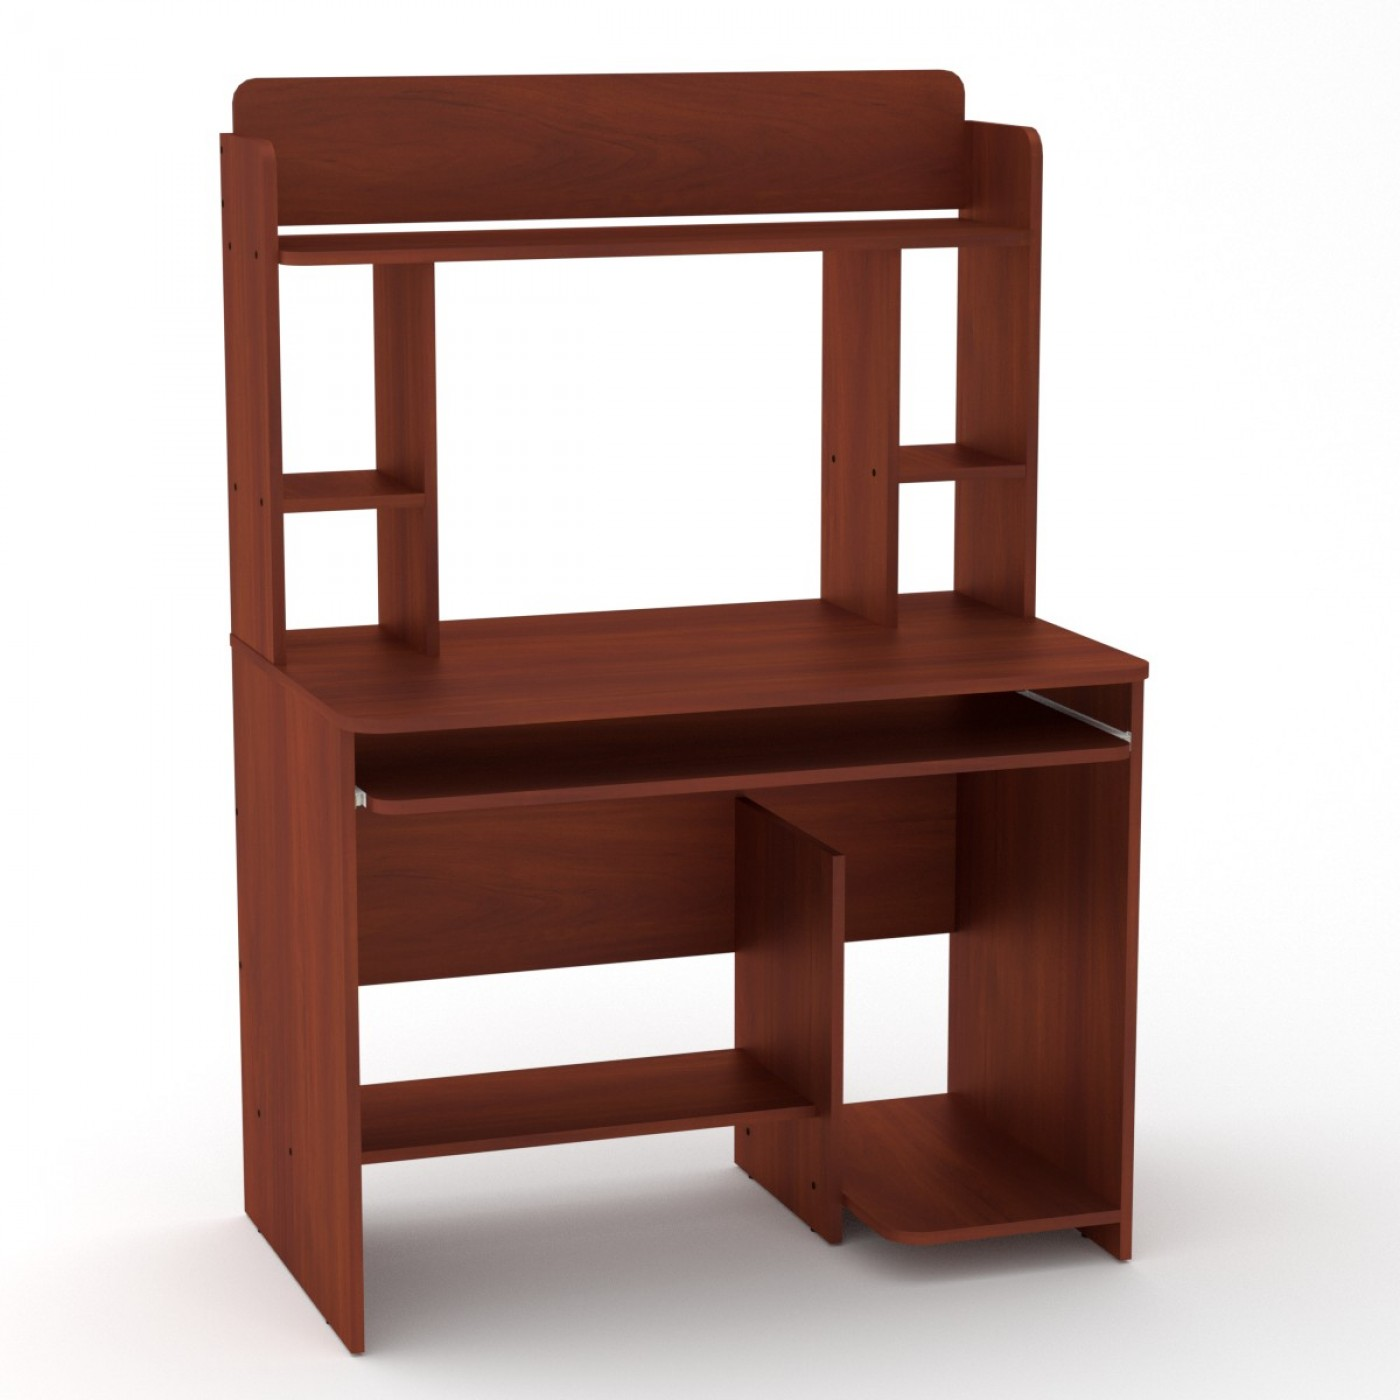 СКМ-6 стол компьютерный